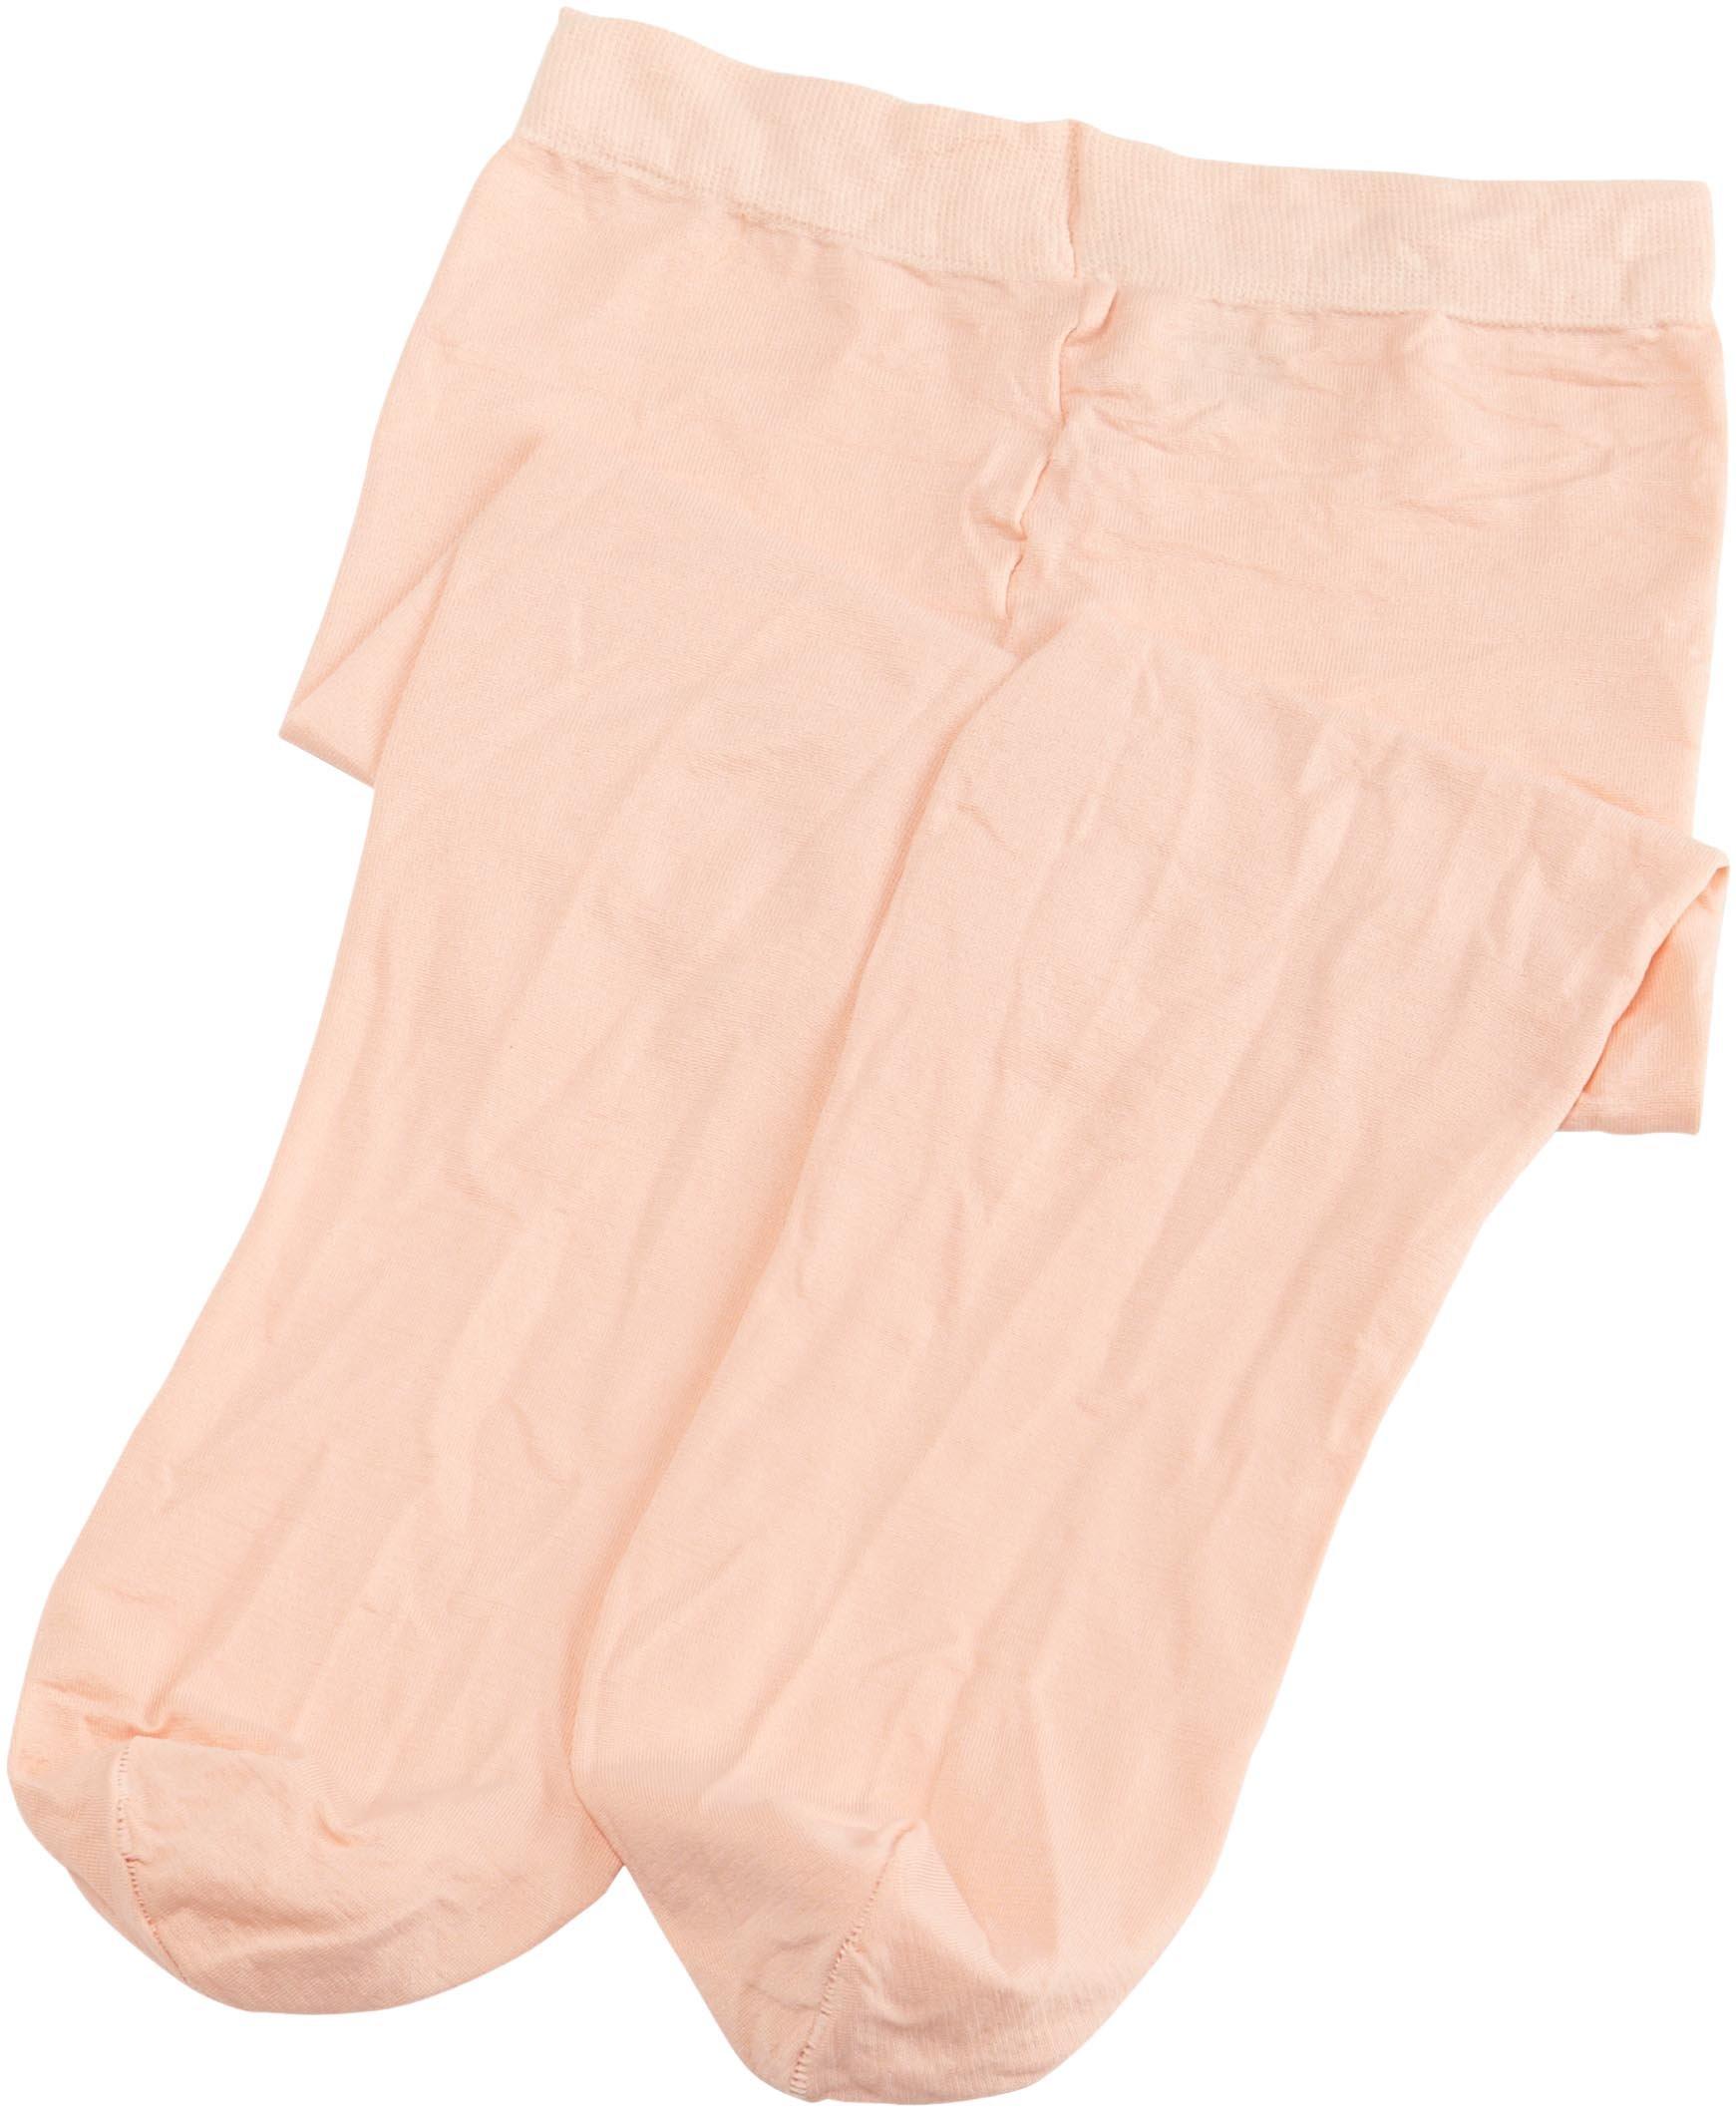 Danskin Little Girls' Student Footed Tight,Ballet Pink,S (4/6)